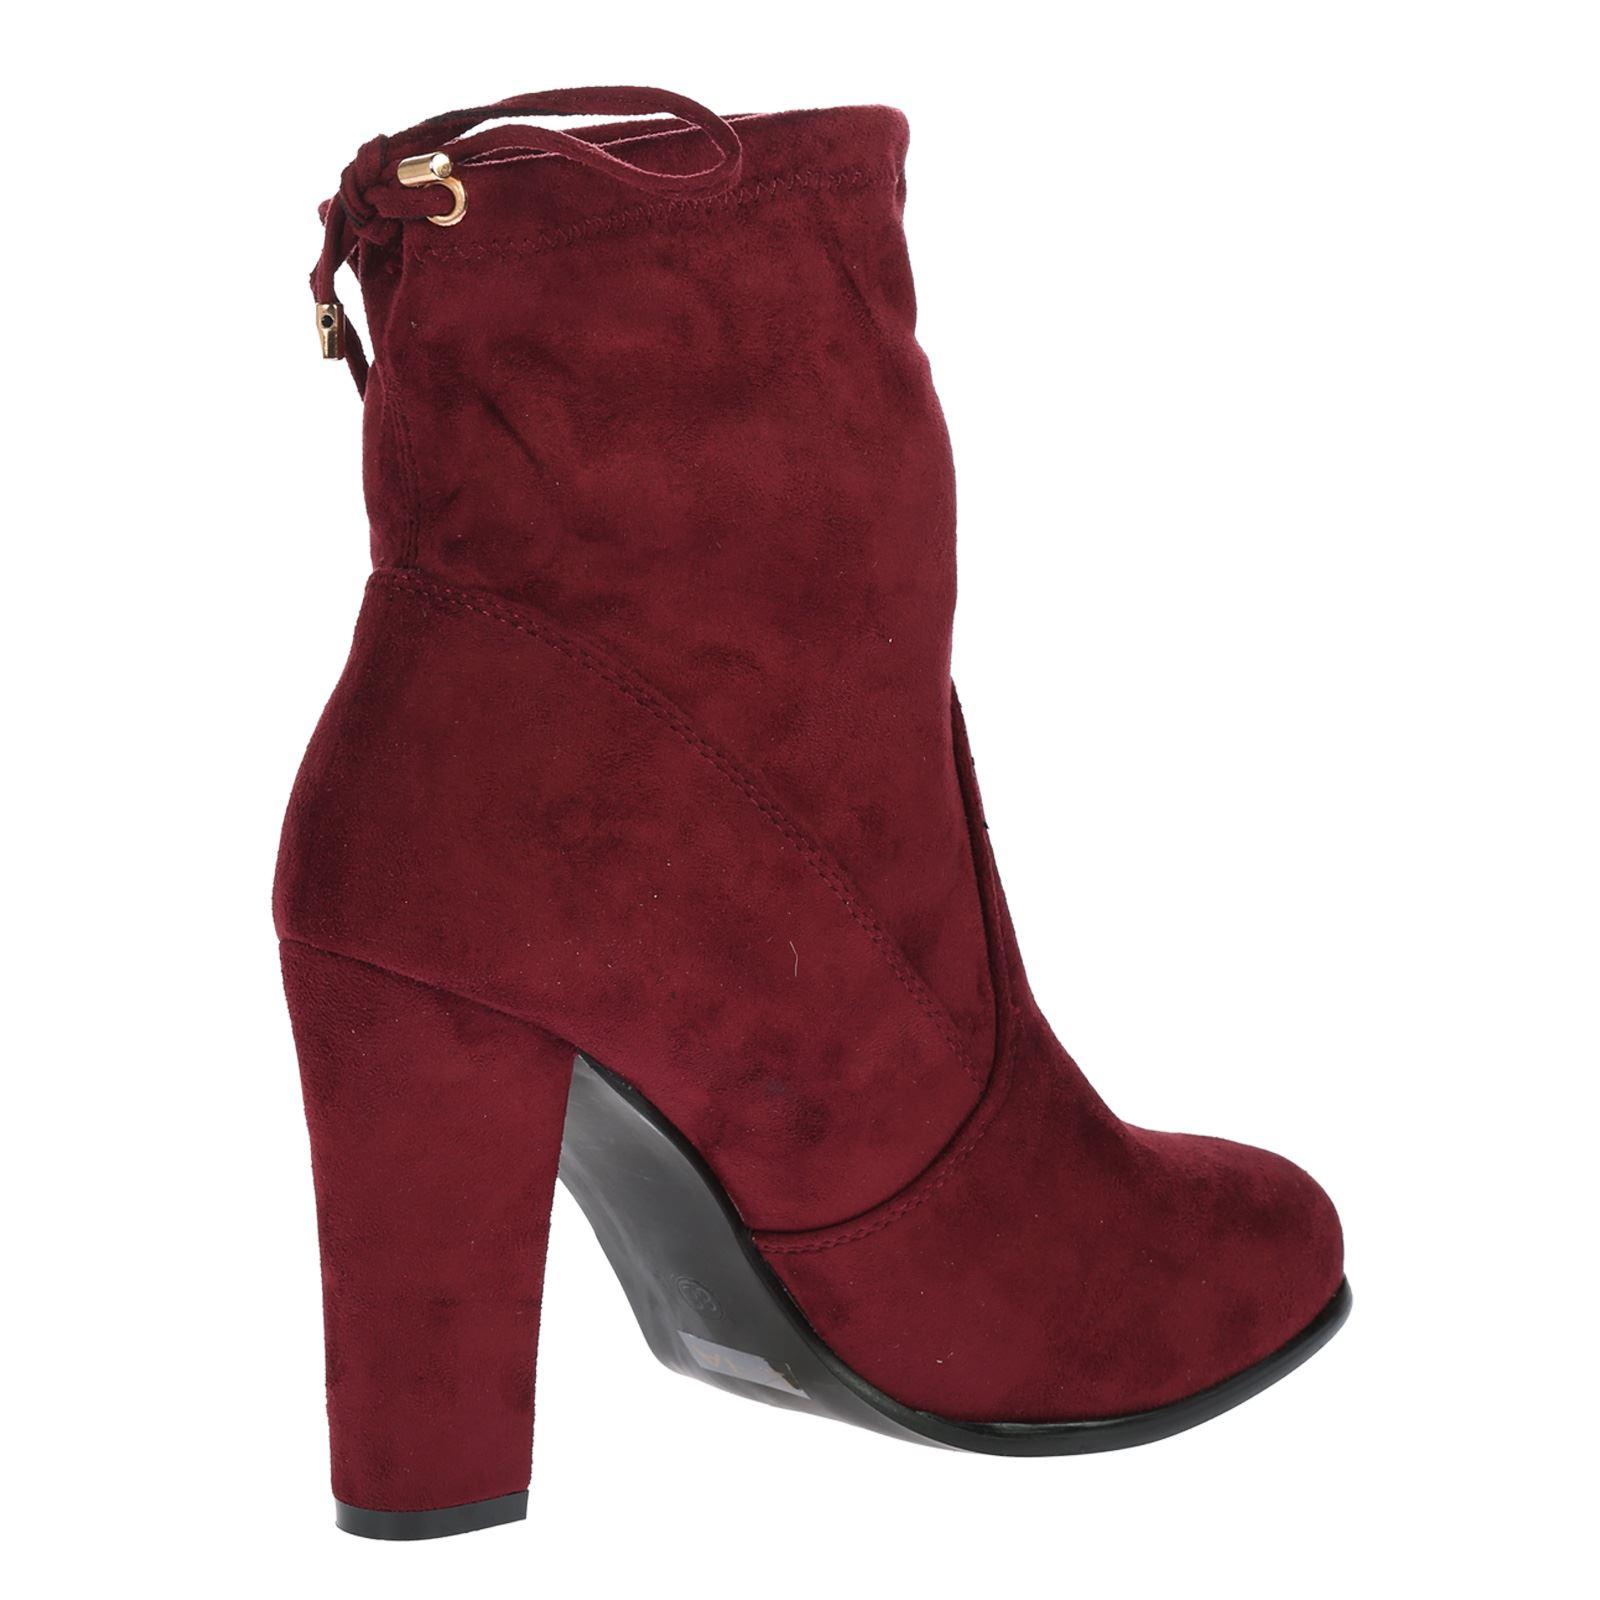 new womens high block heel stretch pull on